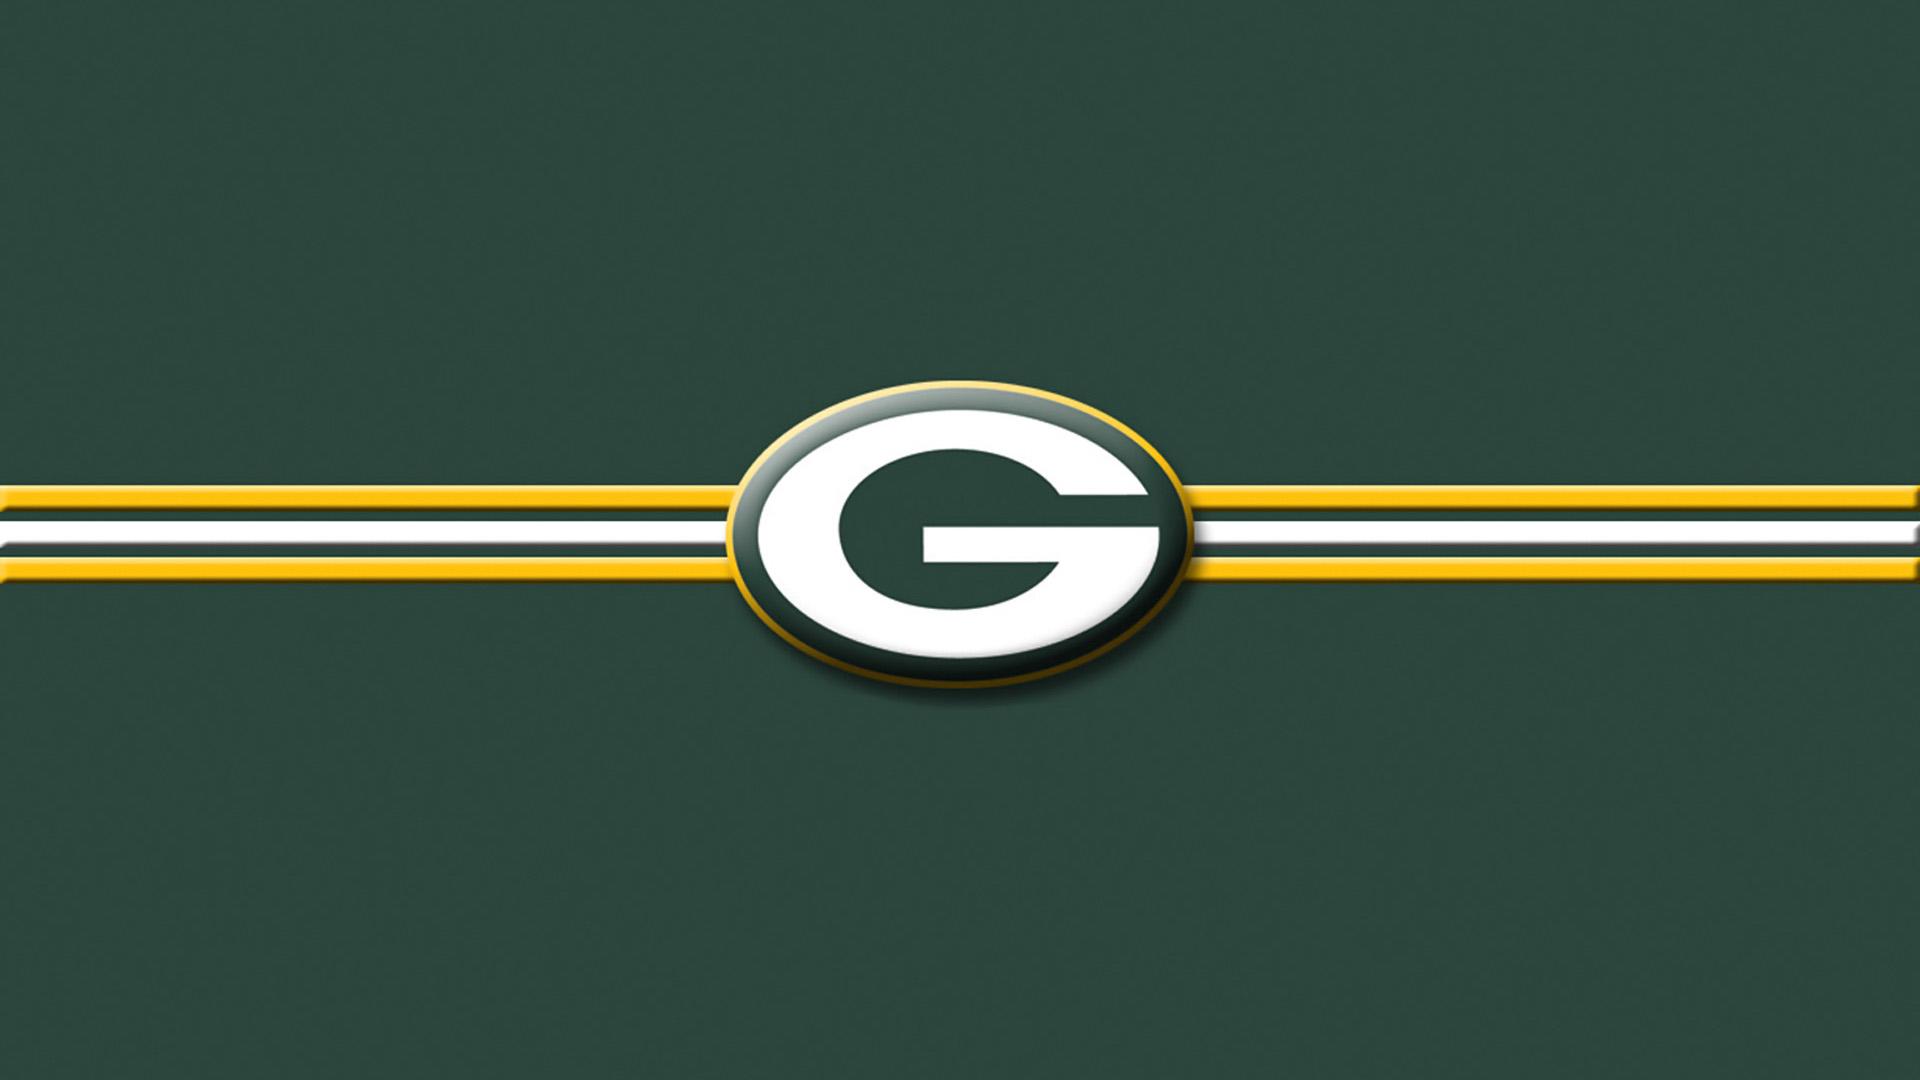 Green Bay Packers Iphone X Wallpaper Green Bay Packers Striped Logo Green 1920 215 1080 Digital